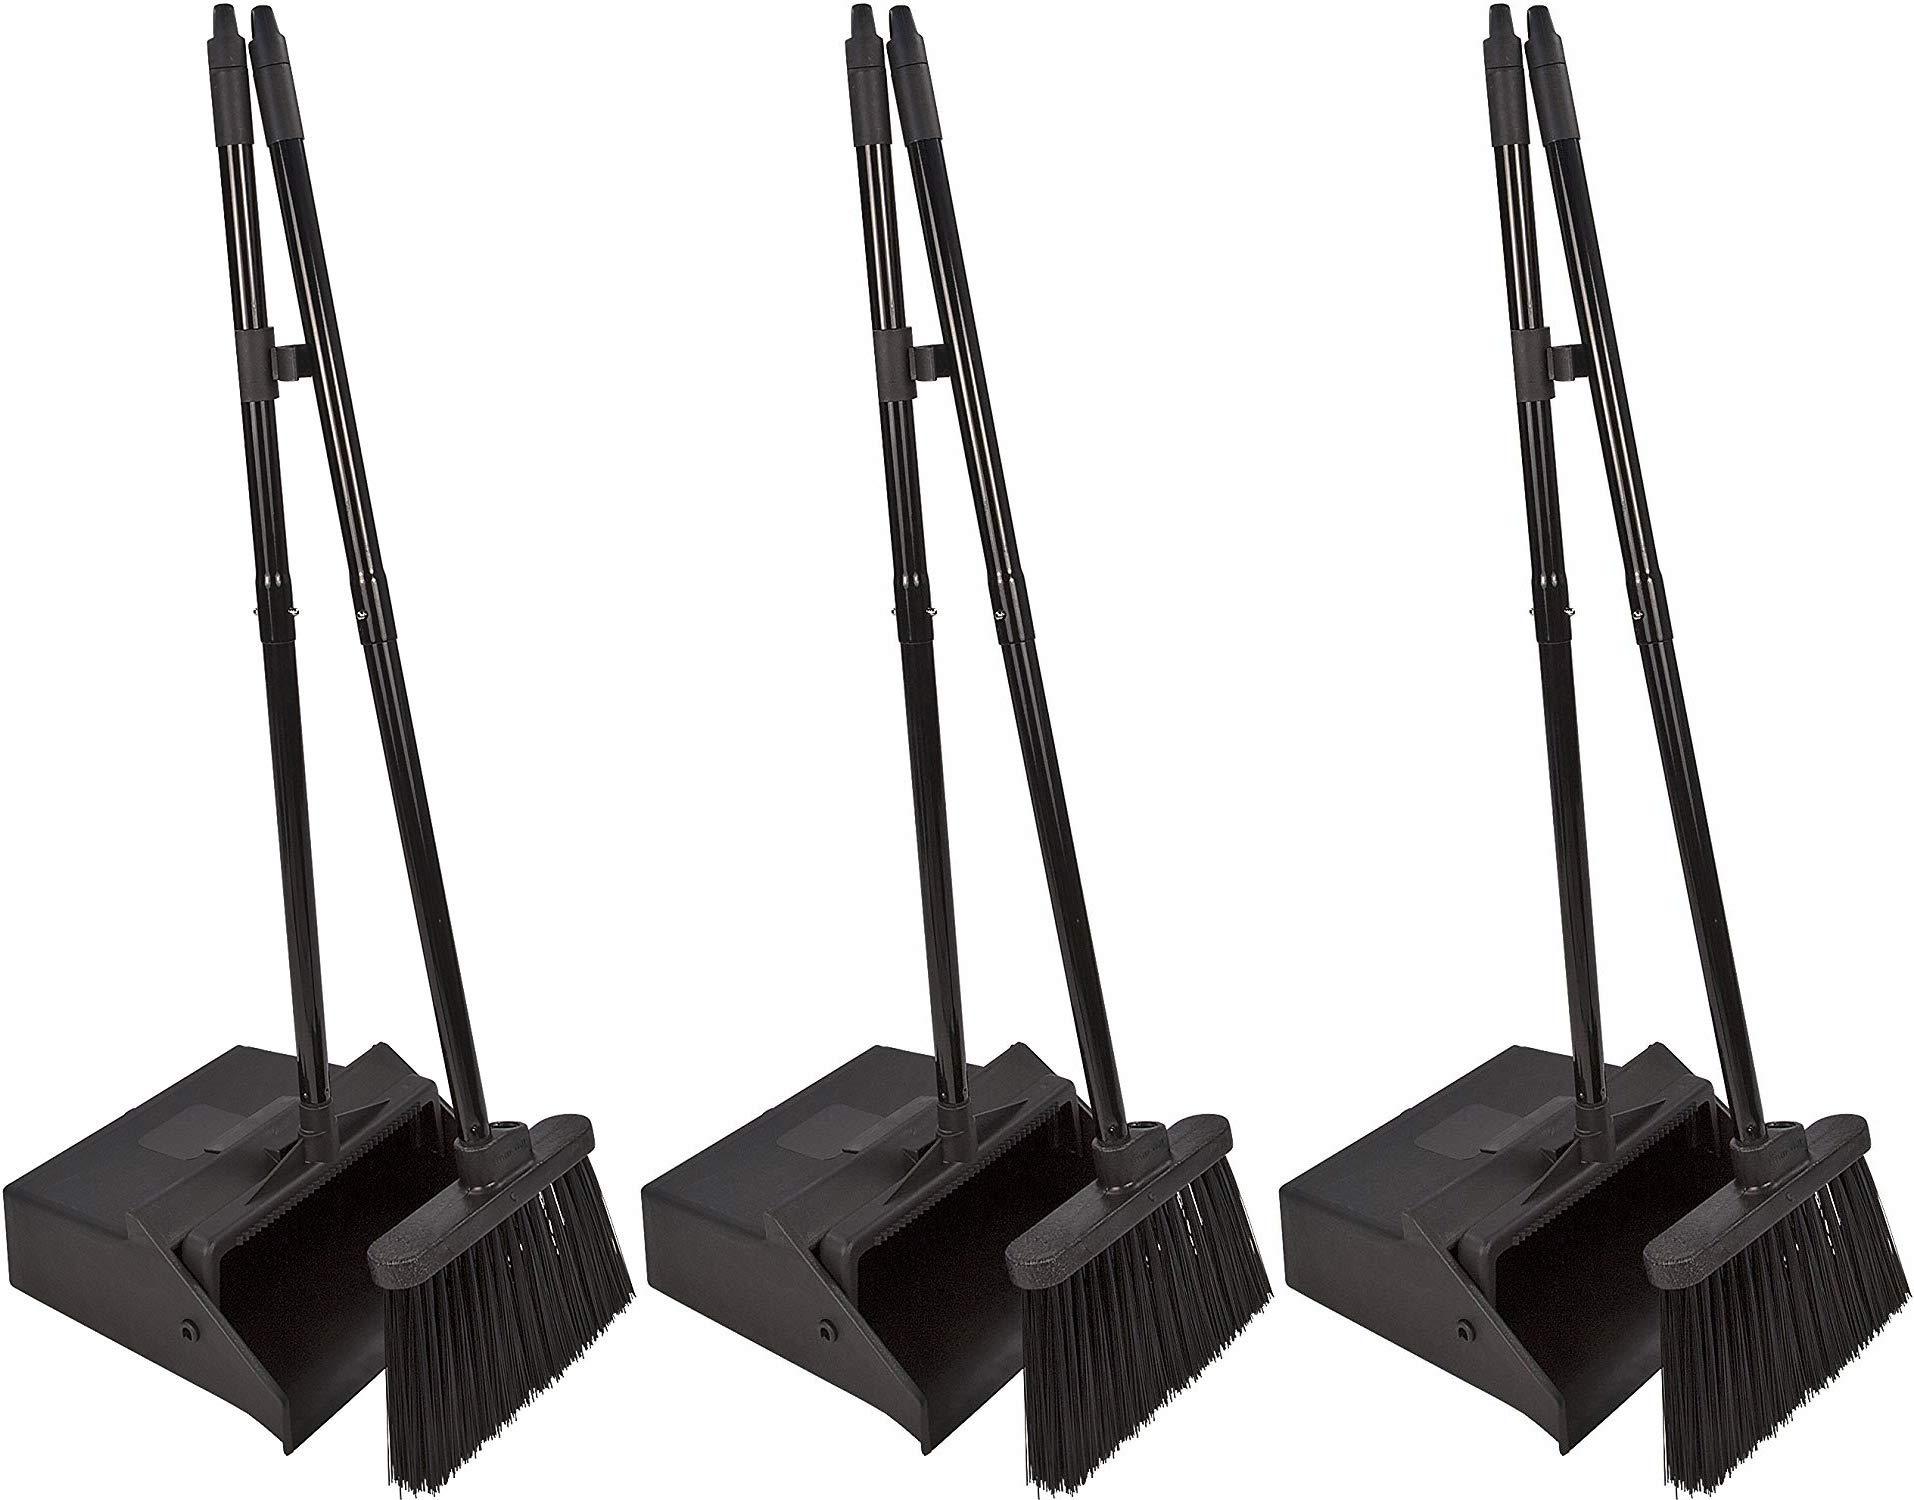 Carlisle 36141503 Duo-Pan Dustpan & Lobby Broom Combo, 3 Foot Overall Height, Black - 3 Pack